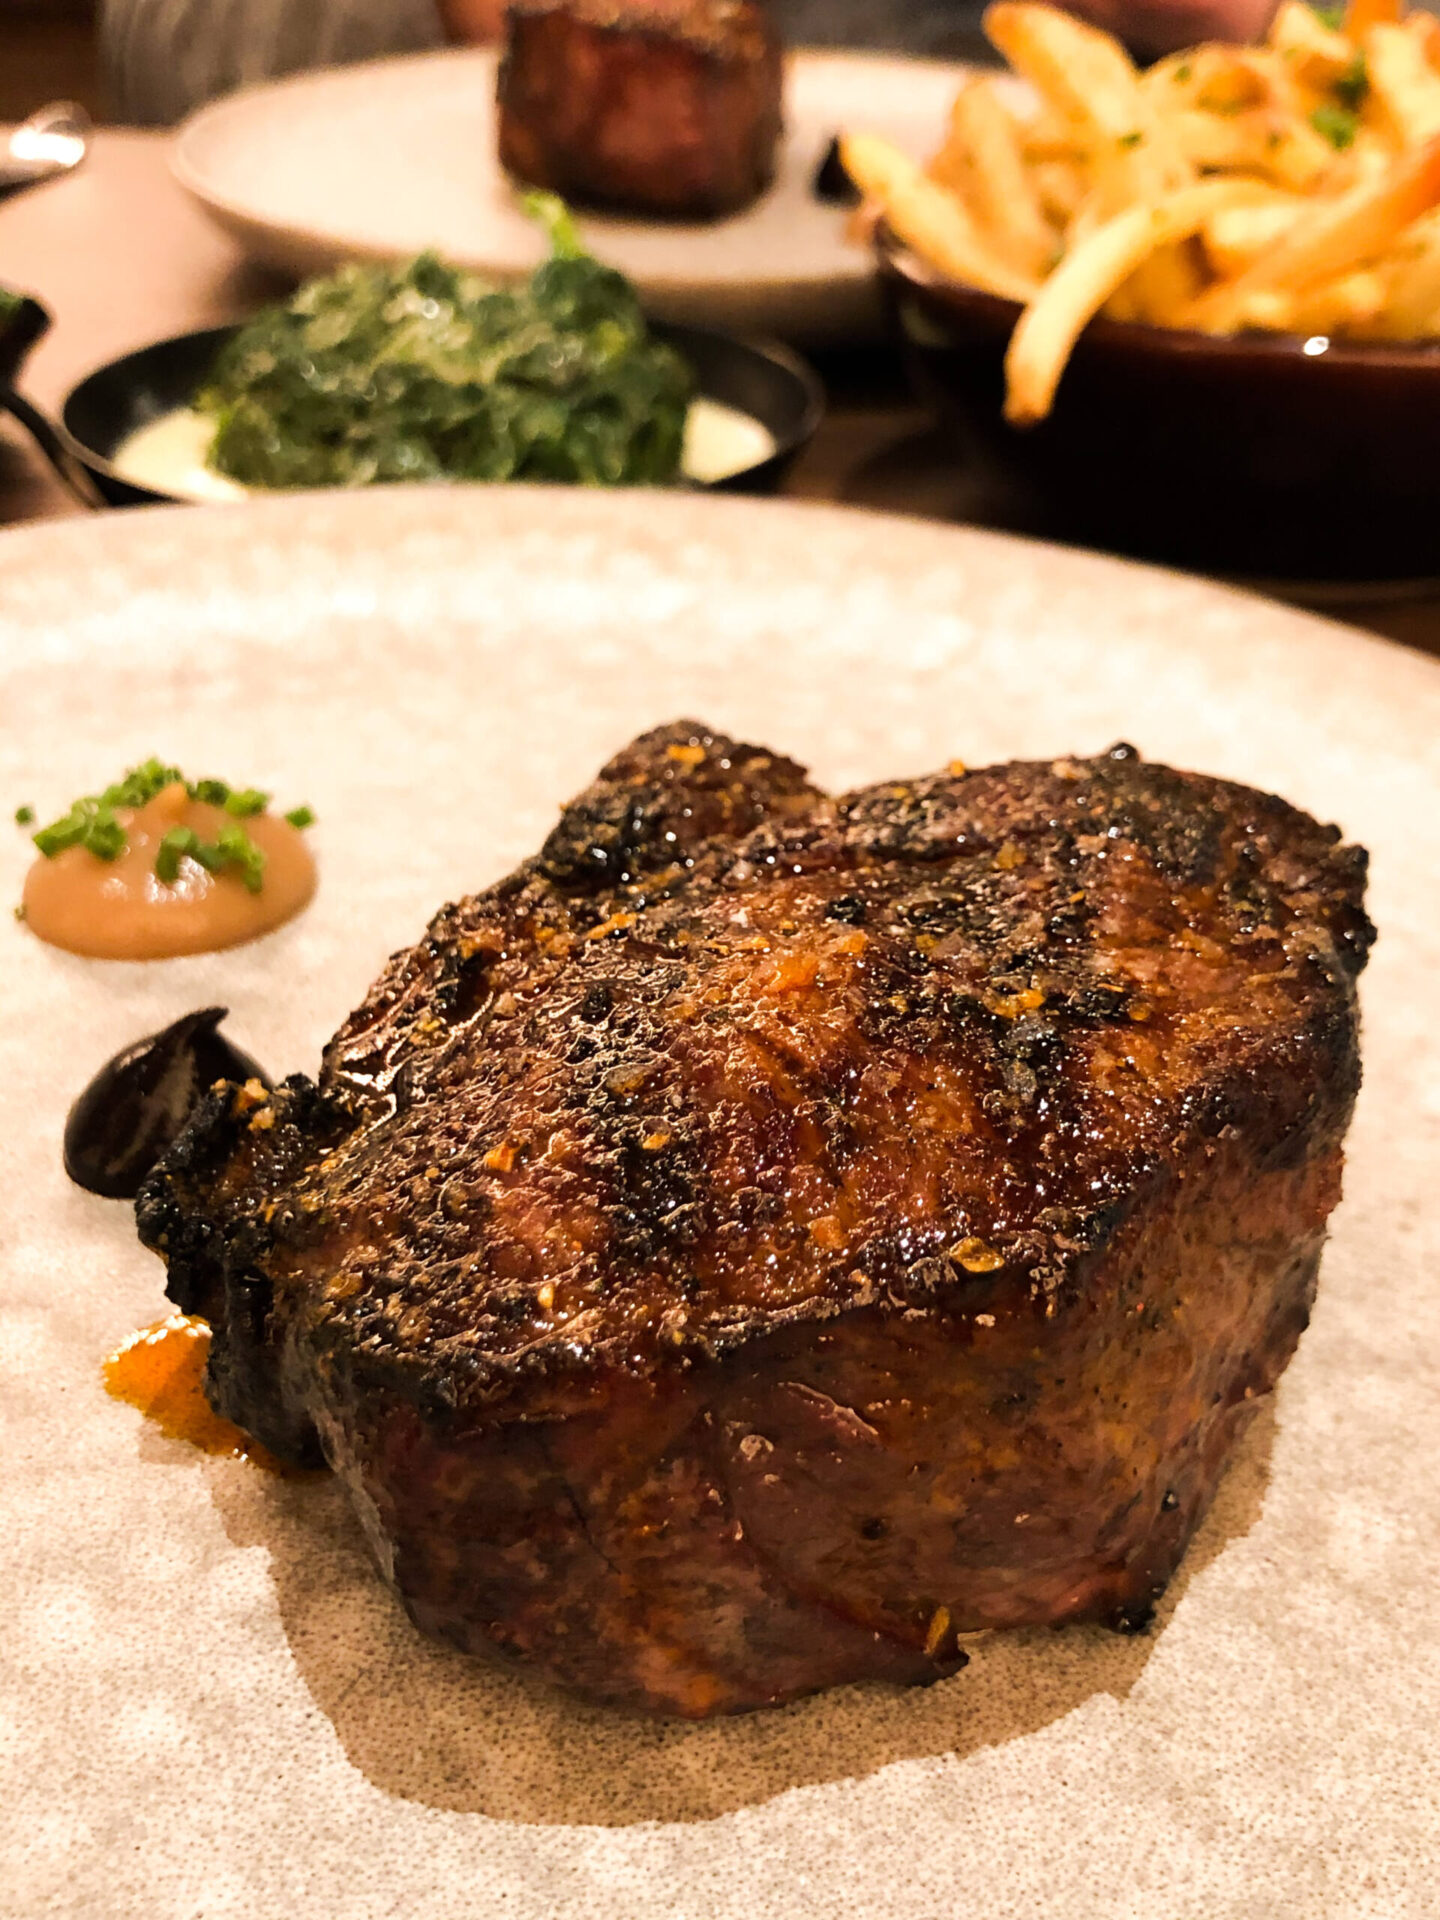 Pulperia steak sirloin